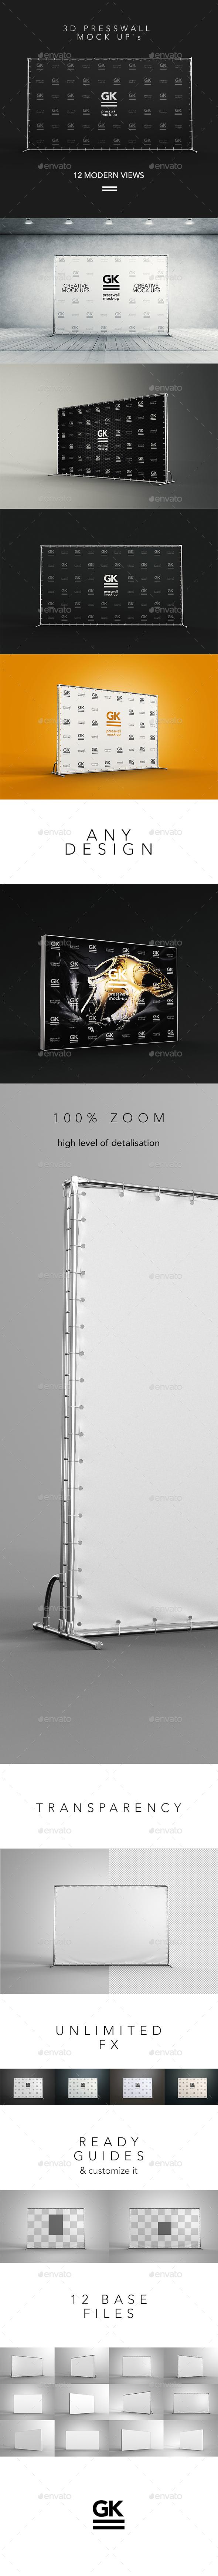 3D Press Wall / Banner Mock Up - Logo Product Mock-Ups